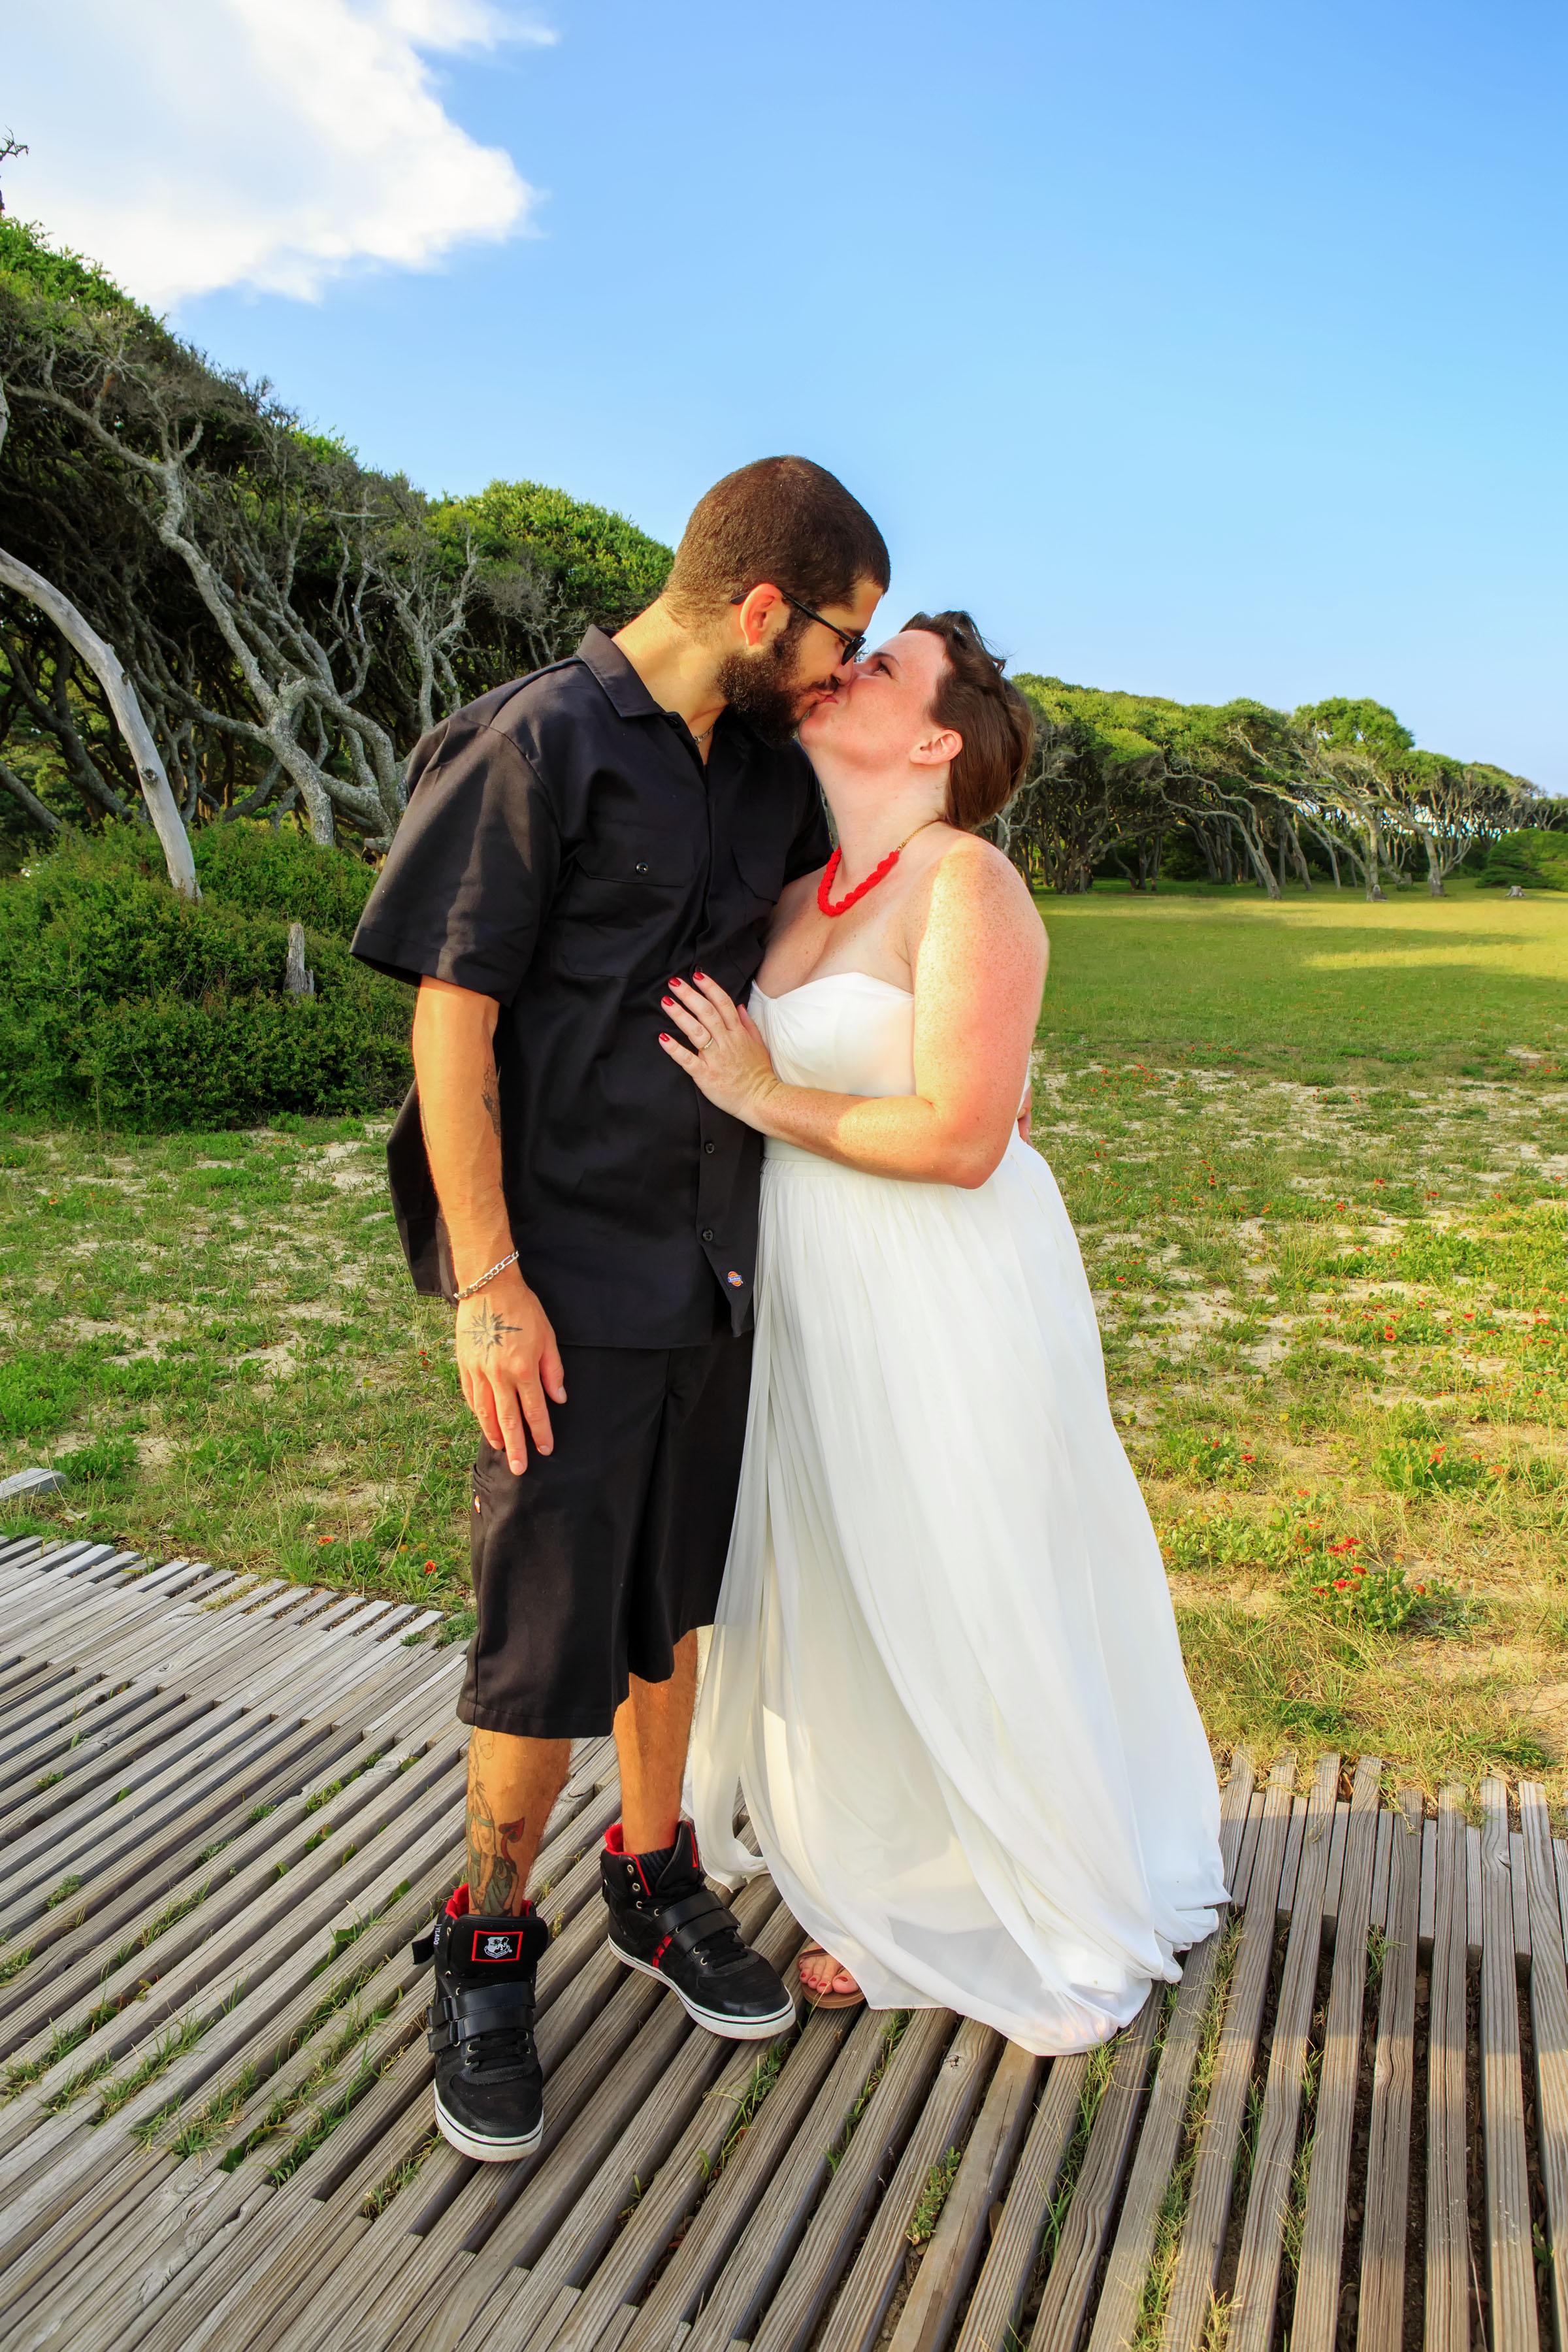 Fort_Fisher_Wedding_Photographer_Tiffany_Abruzzo_66.jpg